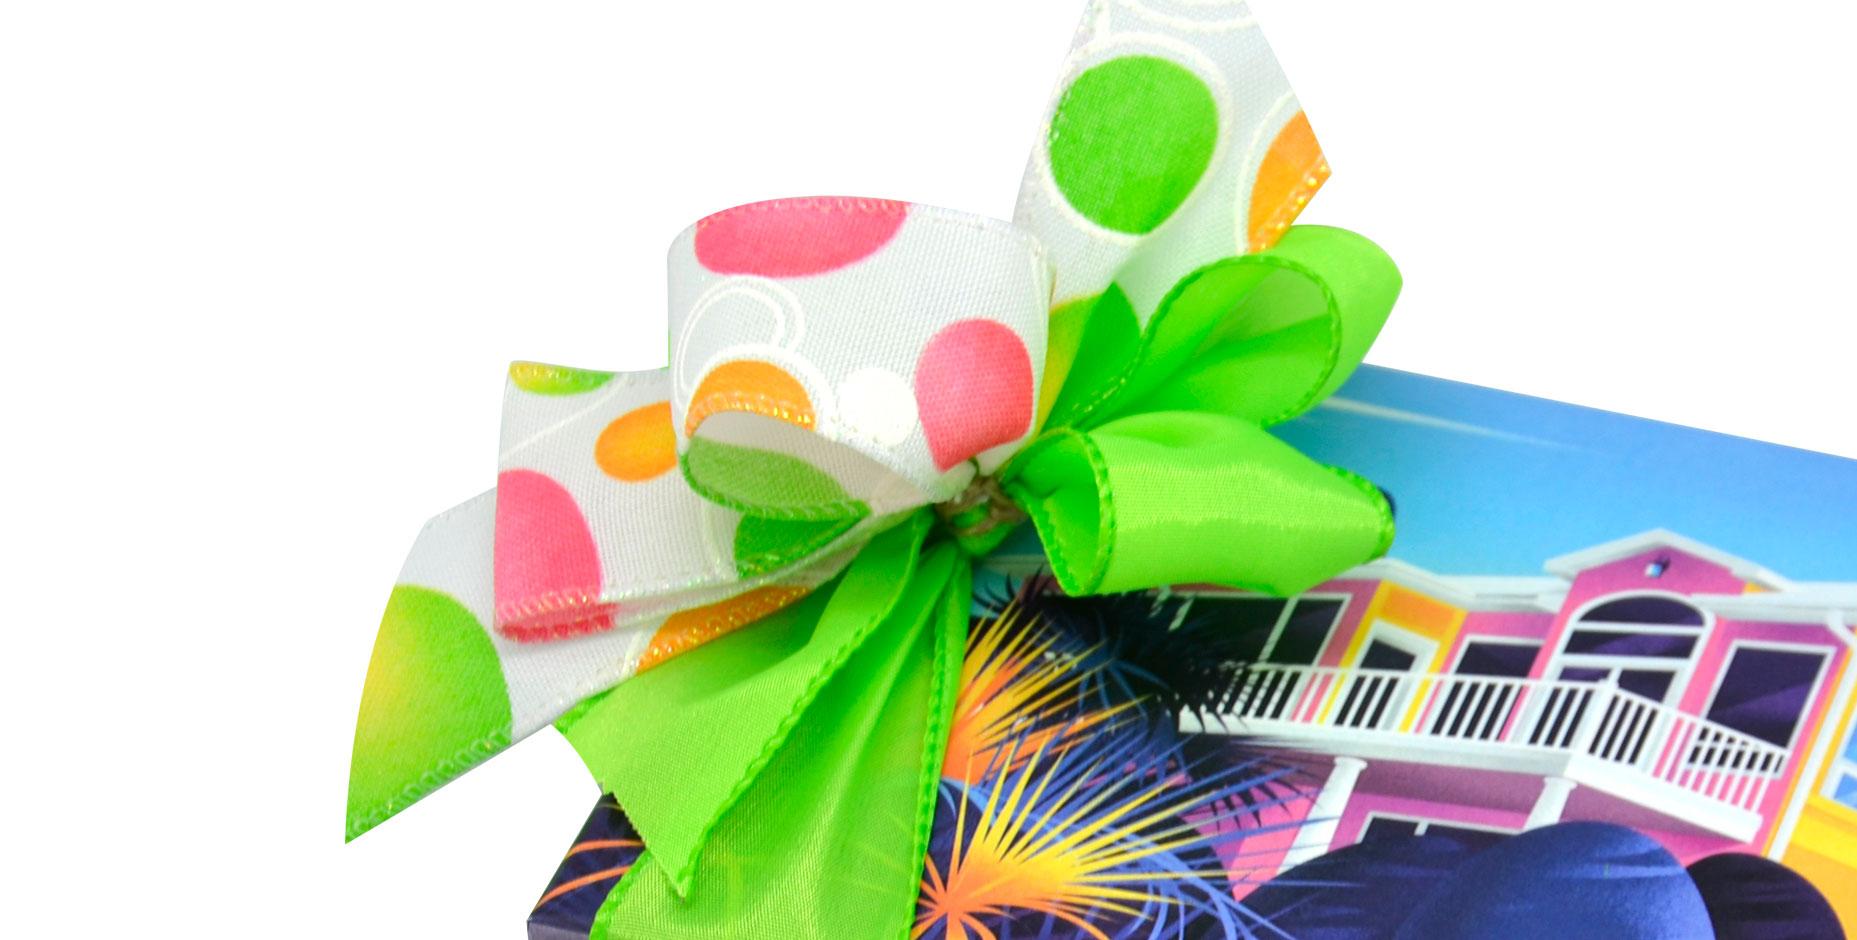 fabricante-cintas-papeles-para-packaging (3).jpg